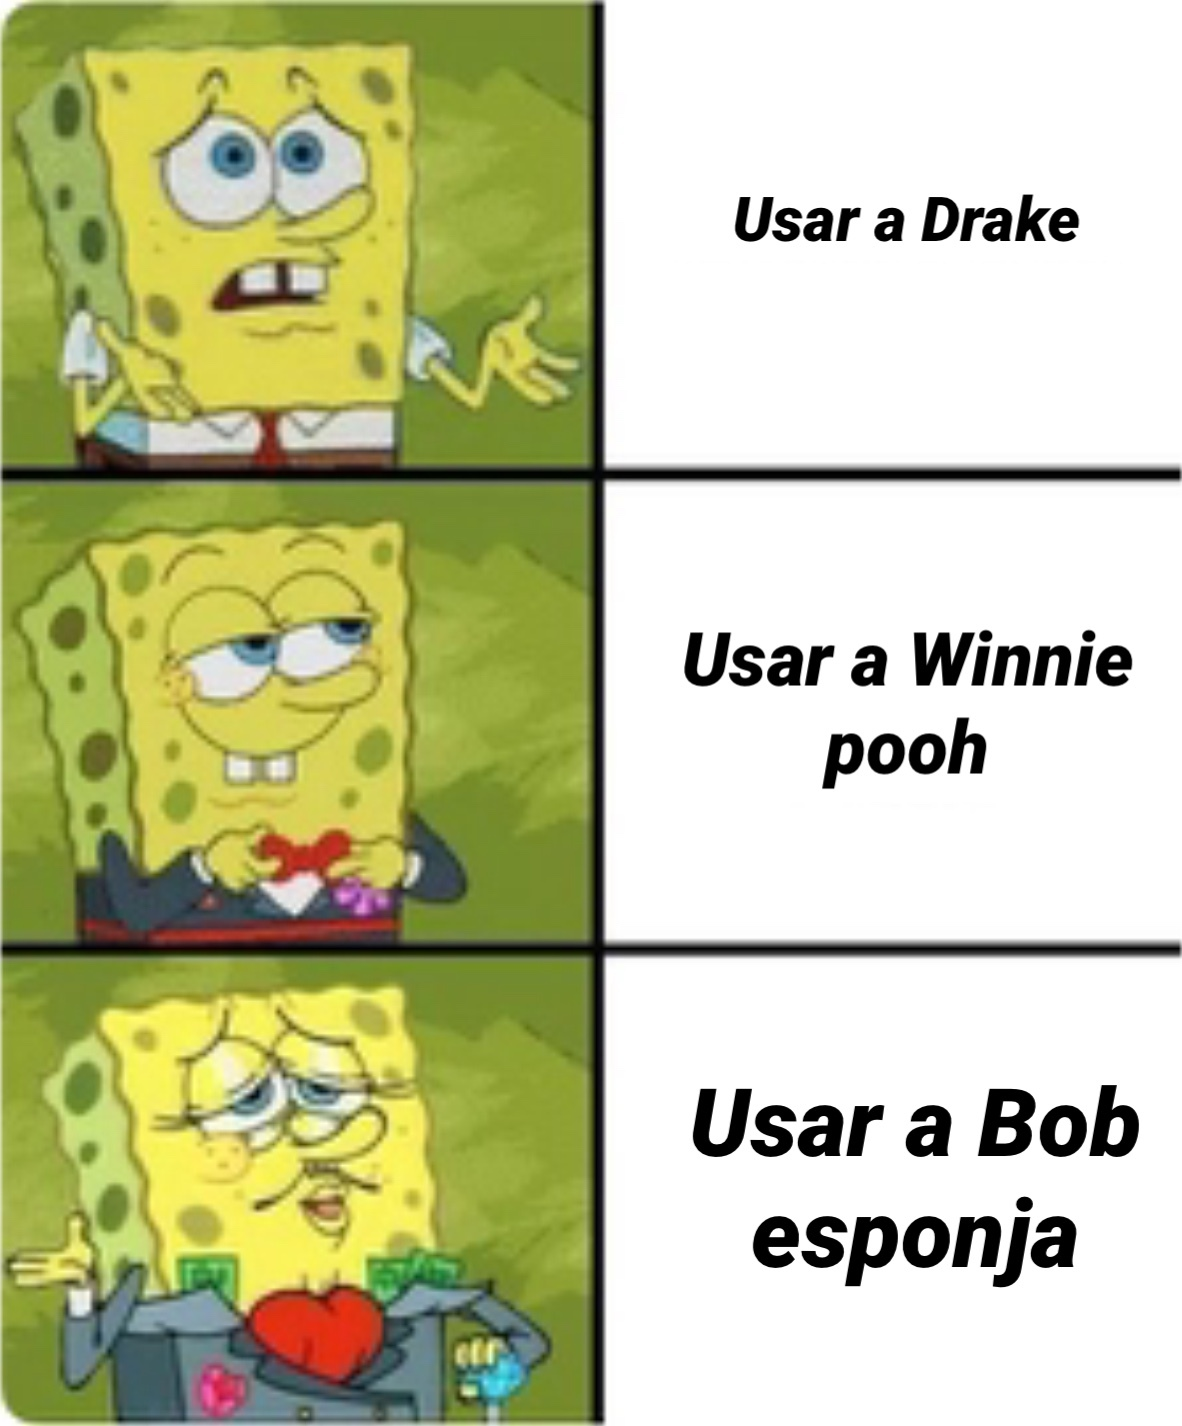 Bob esponja - meme